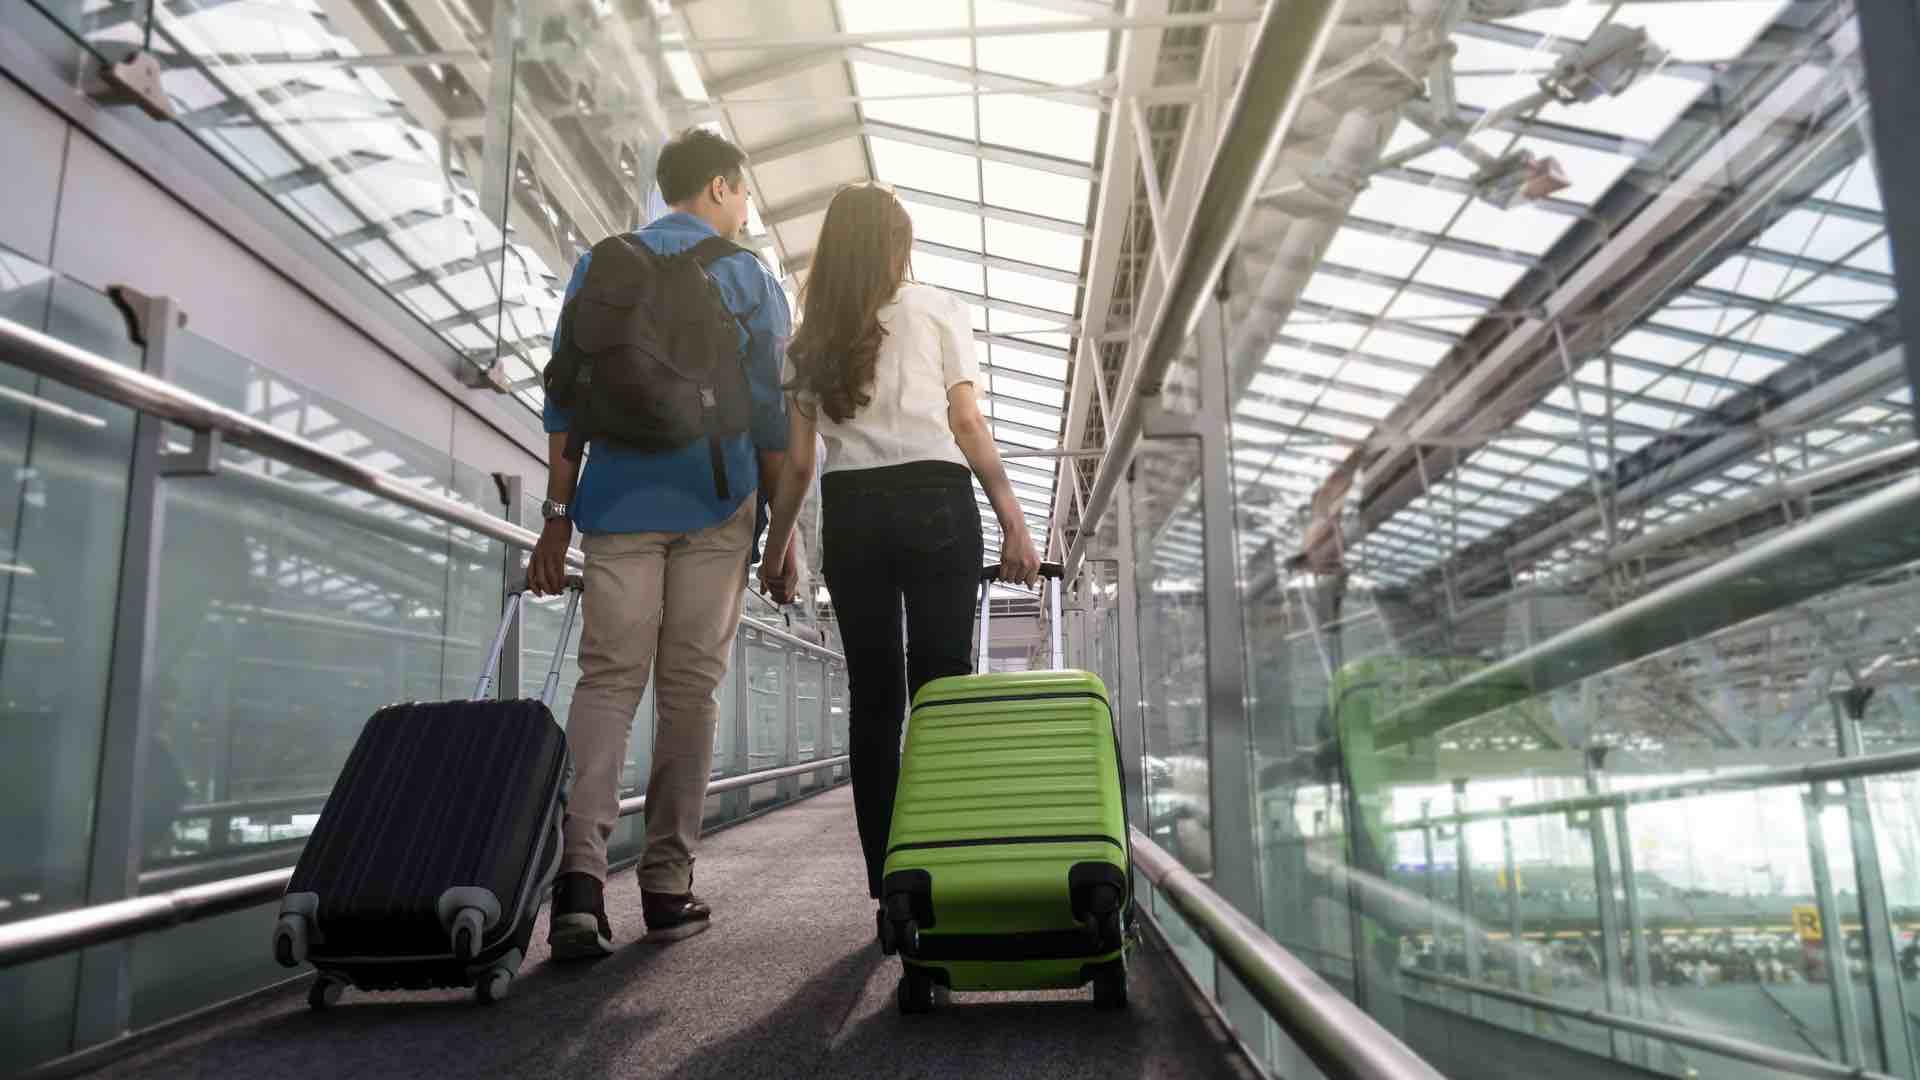 Минздрав обозначил условия для возобновления авиарейсов за границу: пассажиров обяжут пройти тест на КОВИД-19